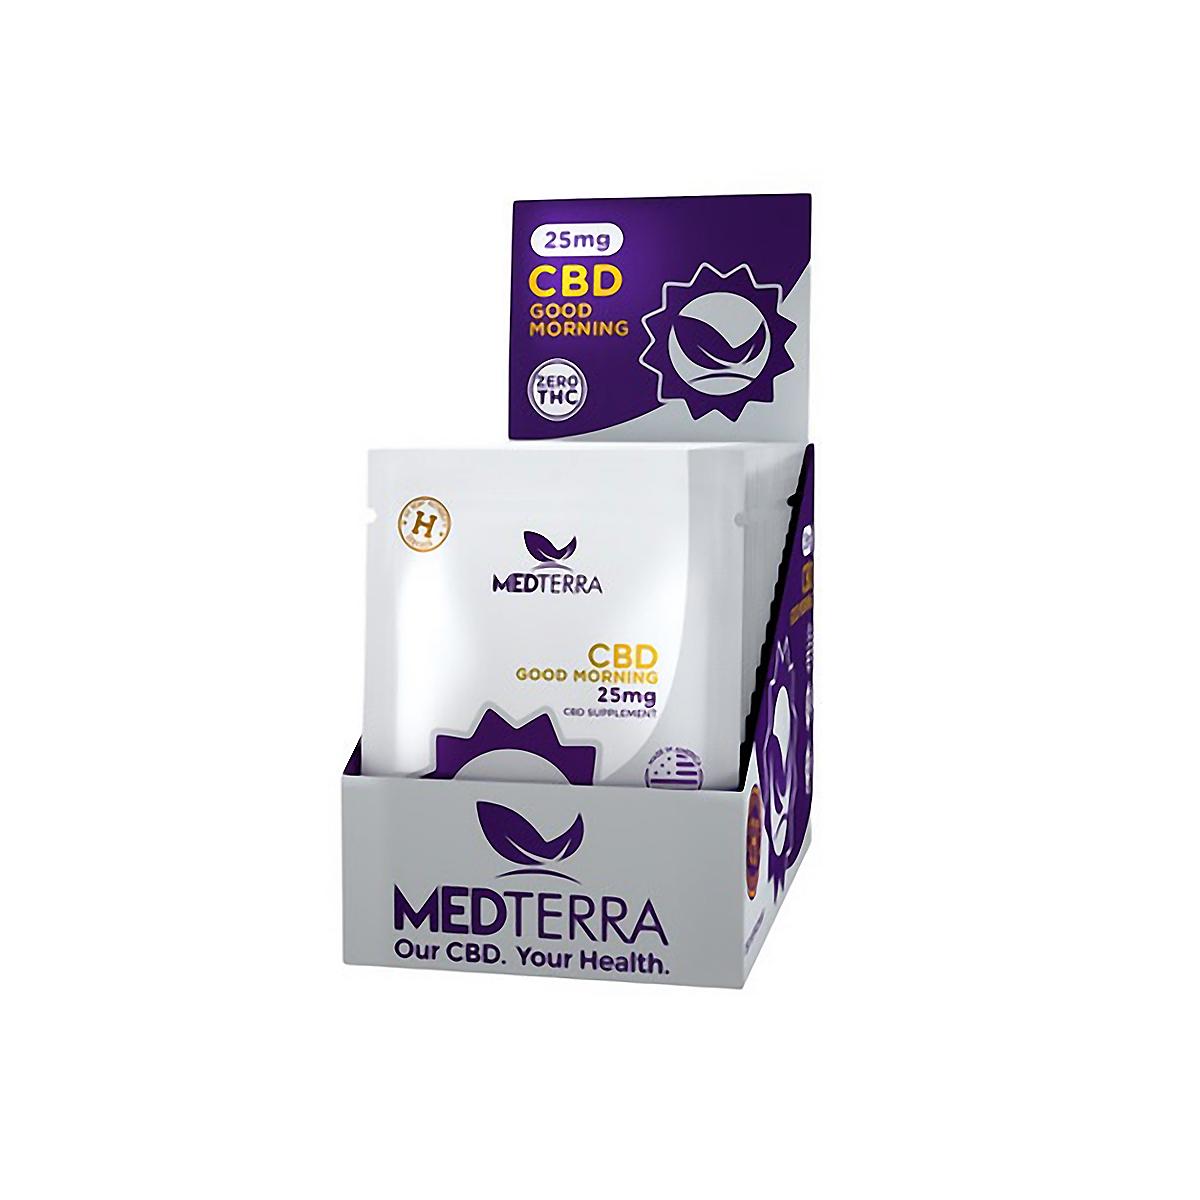 Unisex Medterra CBD Good Morning Capsules 25mg - Color: Box of 20 Size: OS, Box Of 20, large, image 1